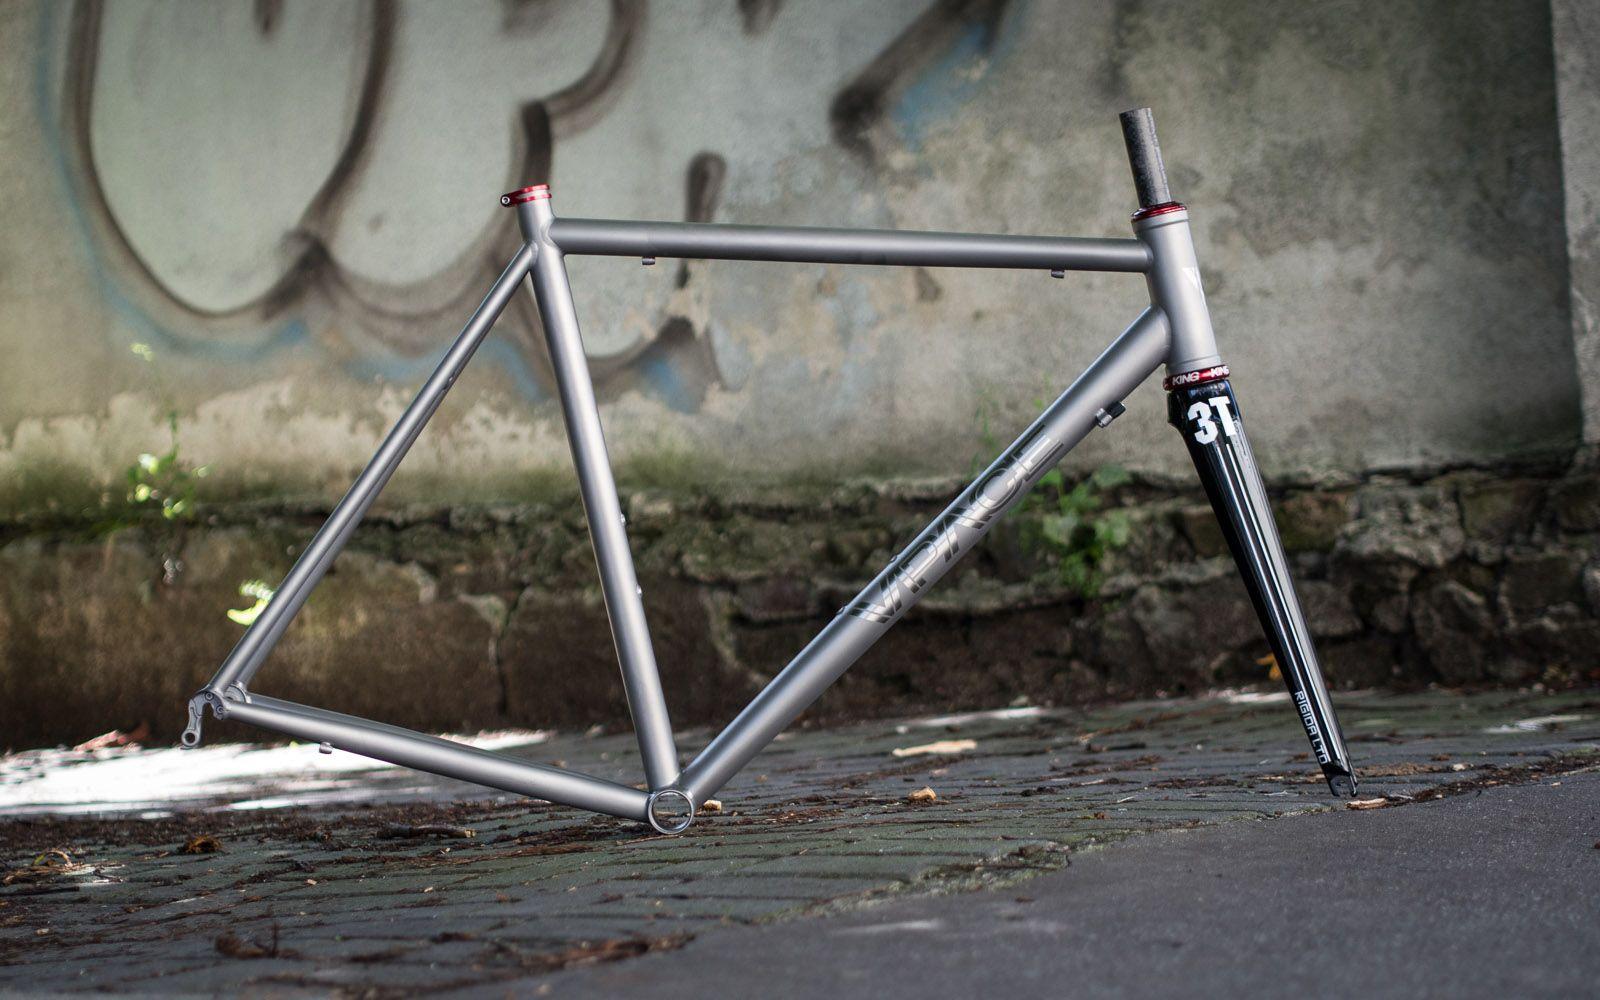 T1r Titan Rennrad Rahmen Bike Details Fixedgear Bicycle